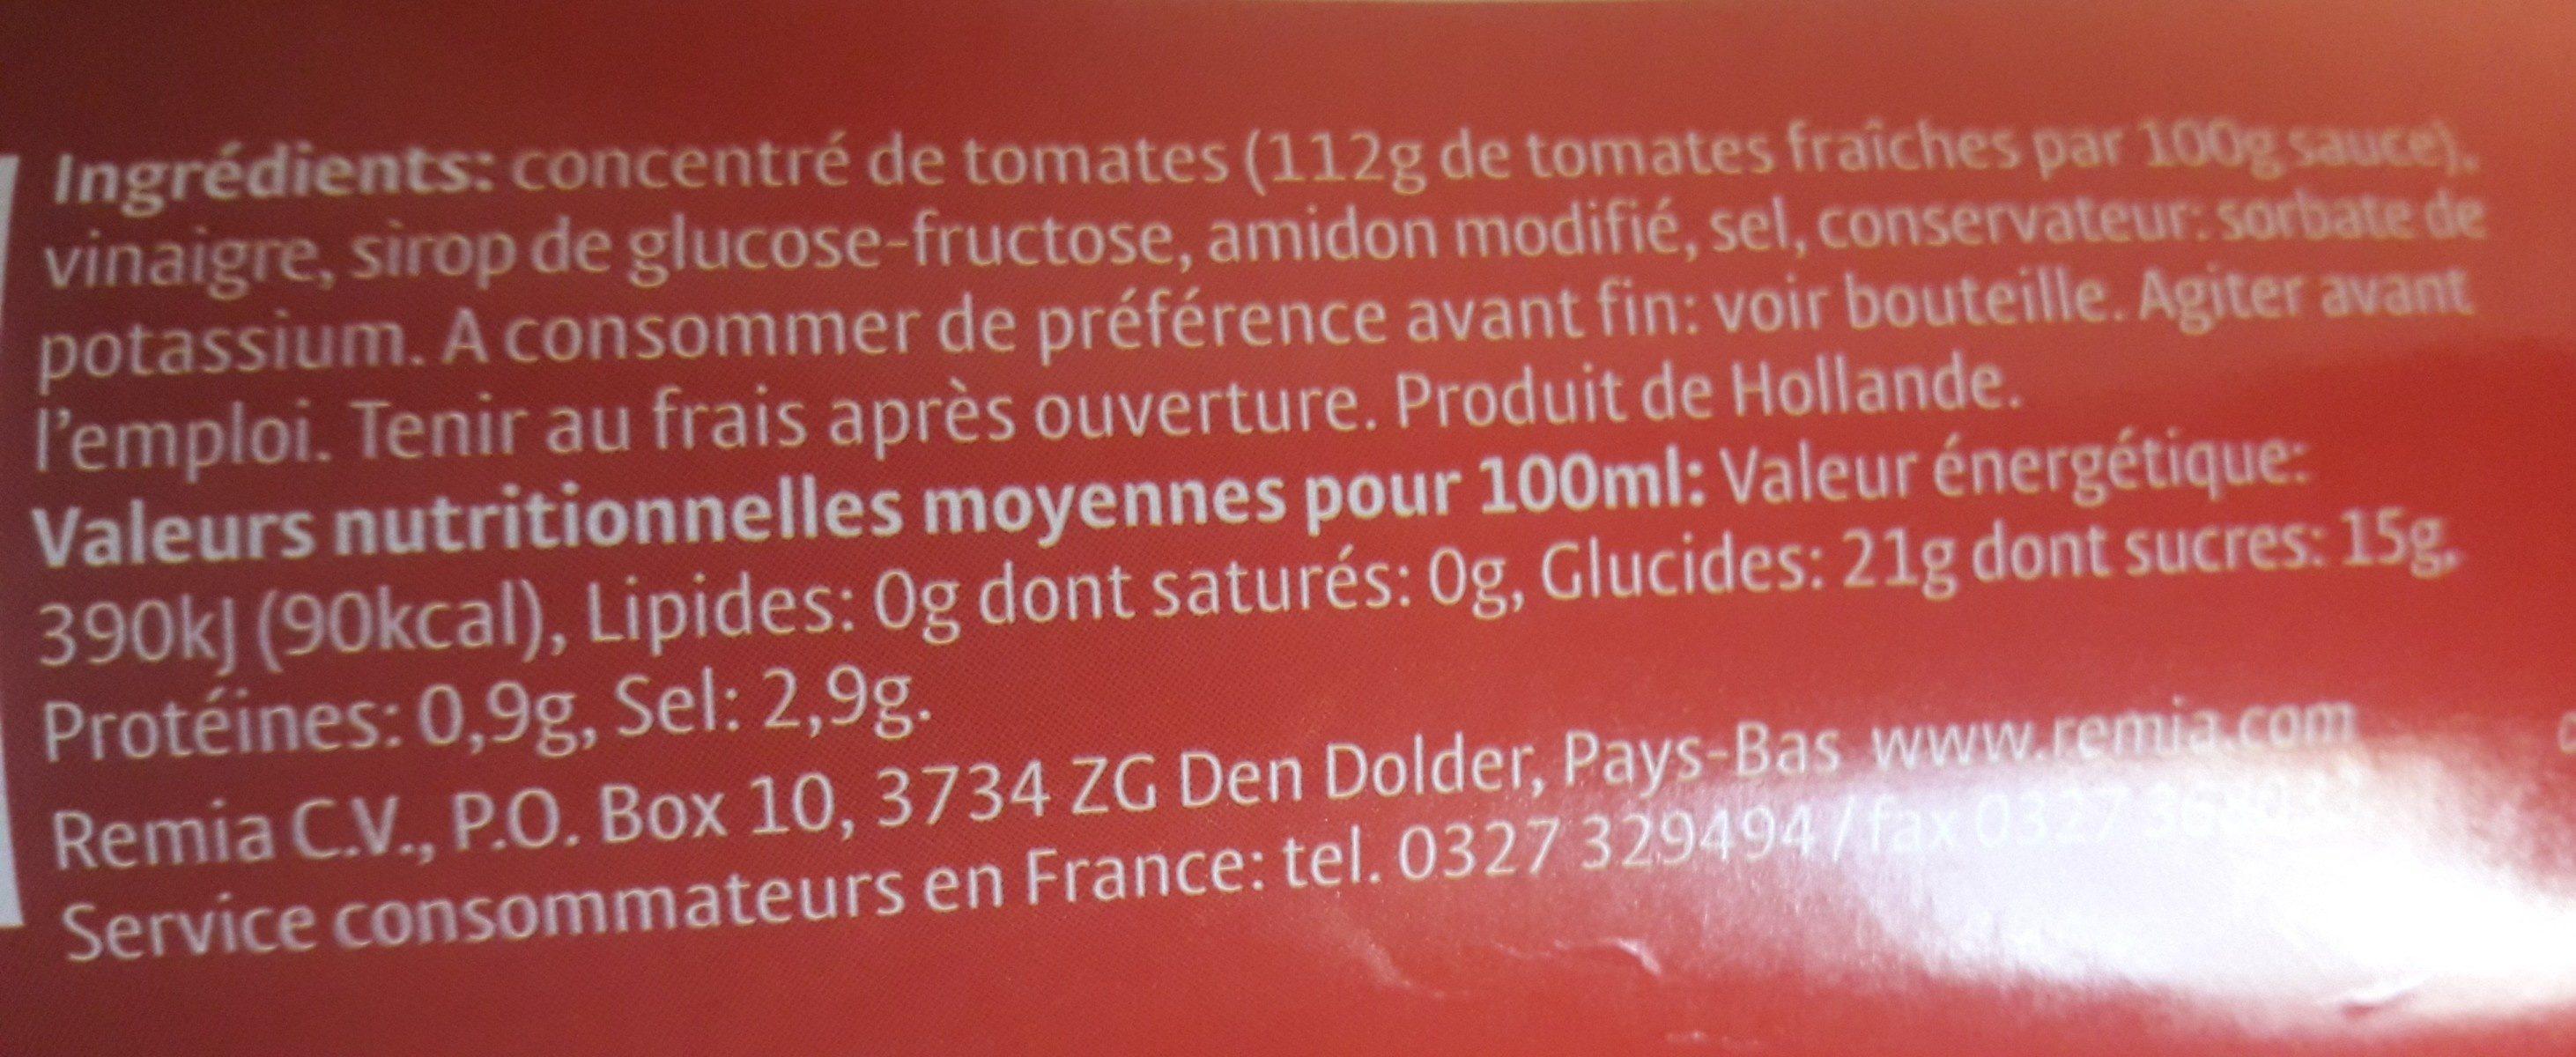 Tomato ketchup - Ingredients - fr